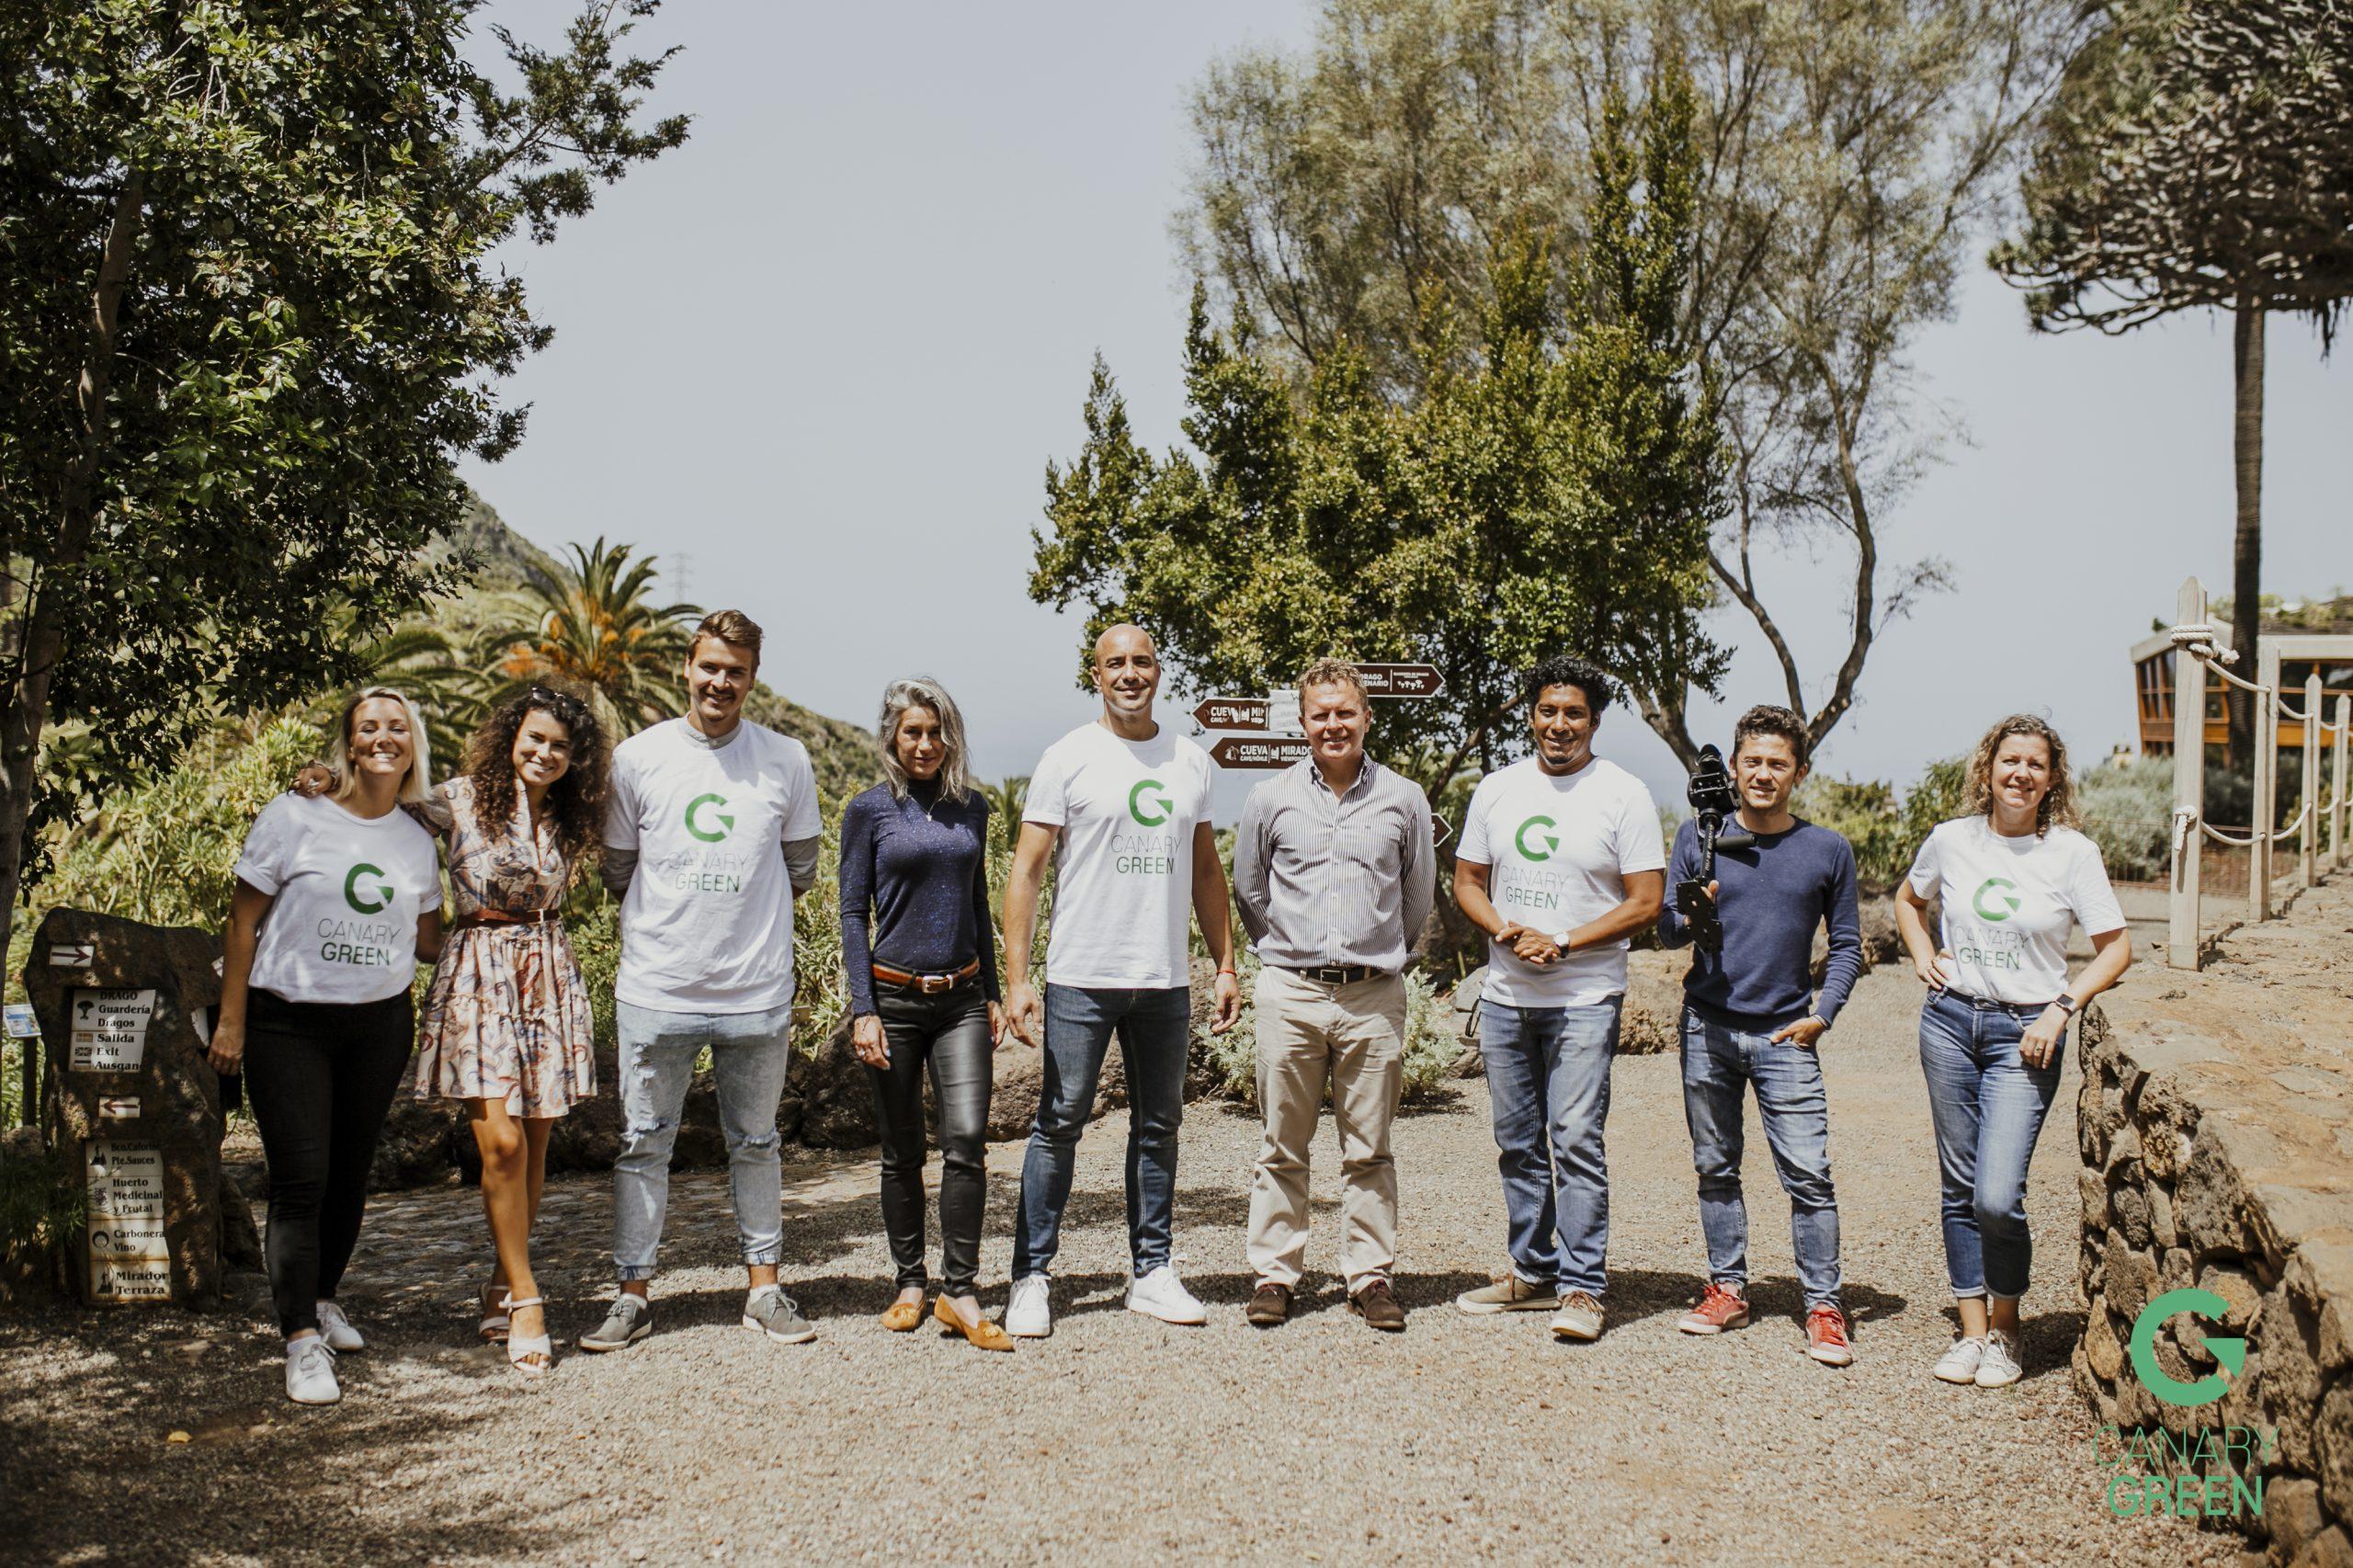 Canary-Green-Team-Erasmus-for-Young-Entrepreneurs